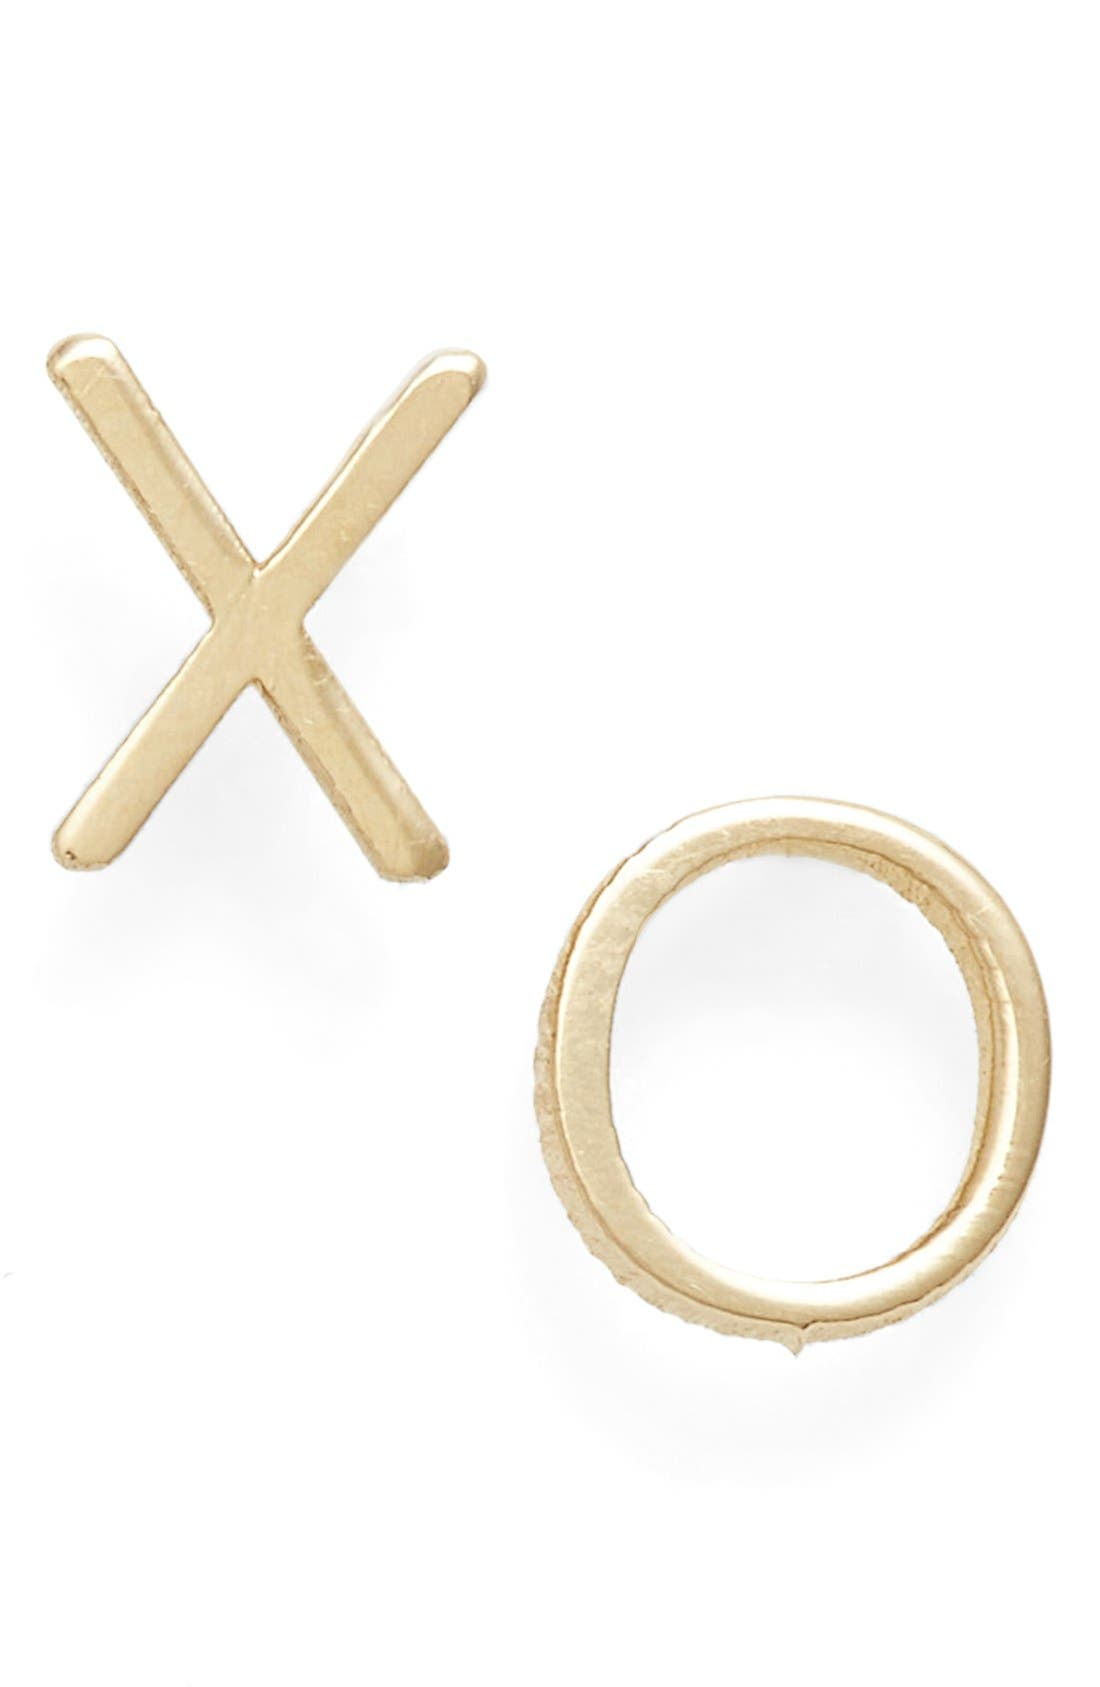 Alternate Image 1 Selected - Poppy Finch 'XO' Stud Earrings